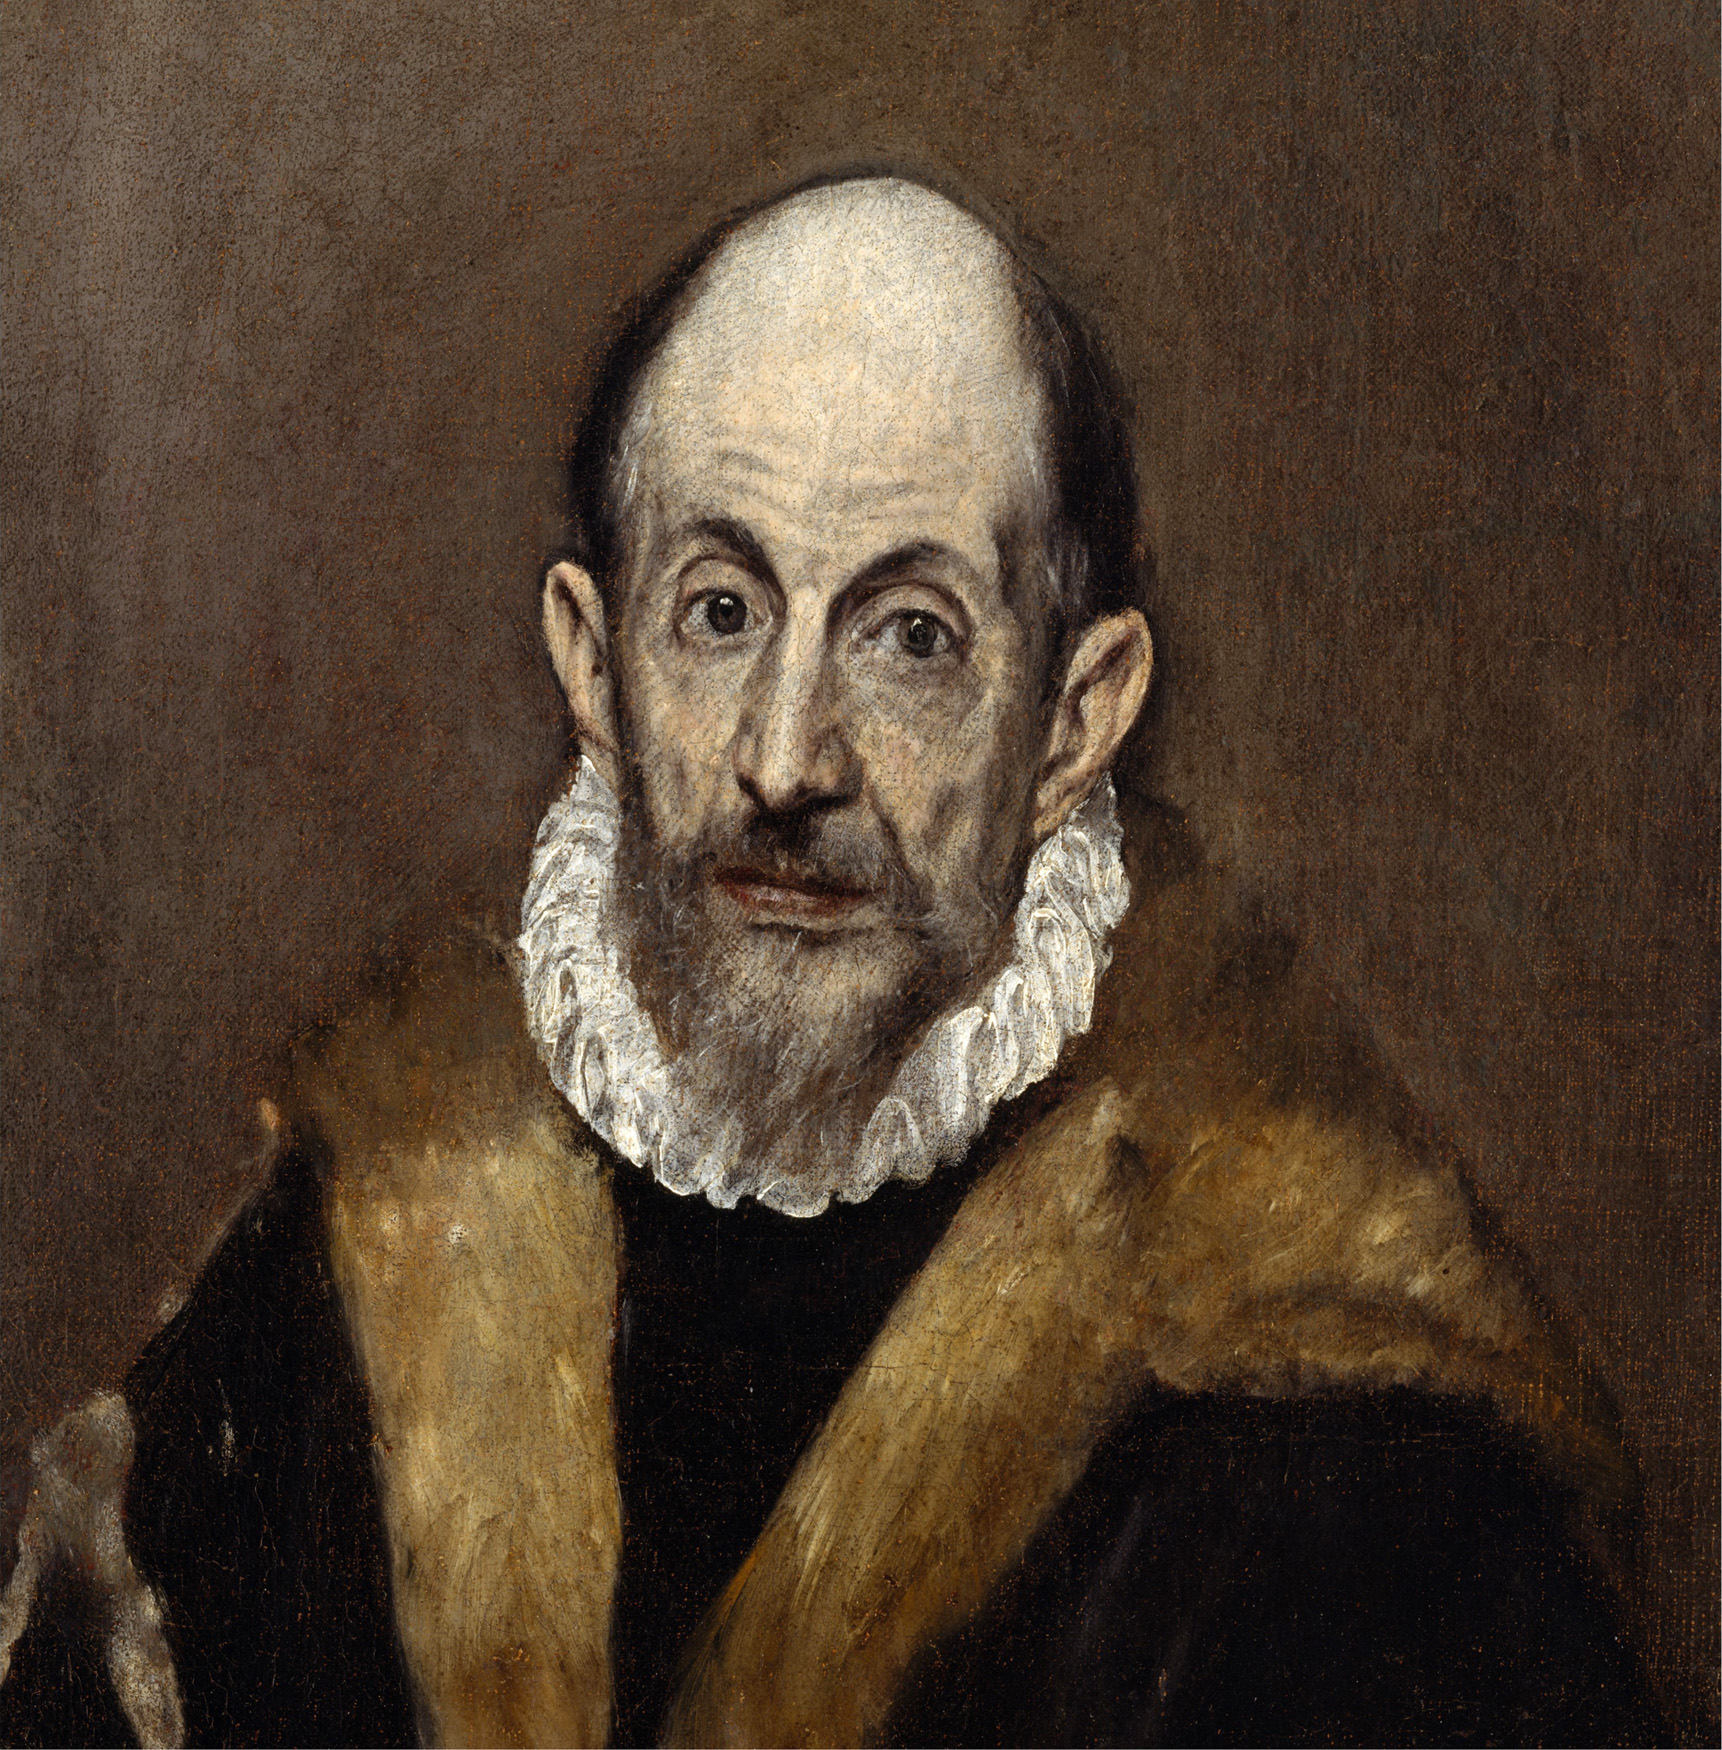 Download El_Greco - Portrait_of_a_Man | Daily Dose of Art